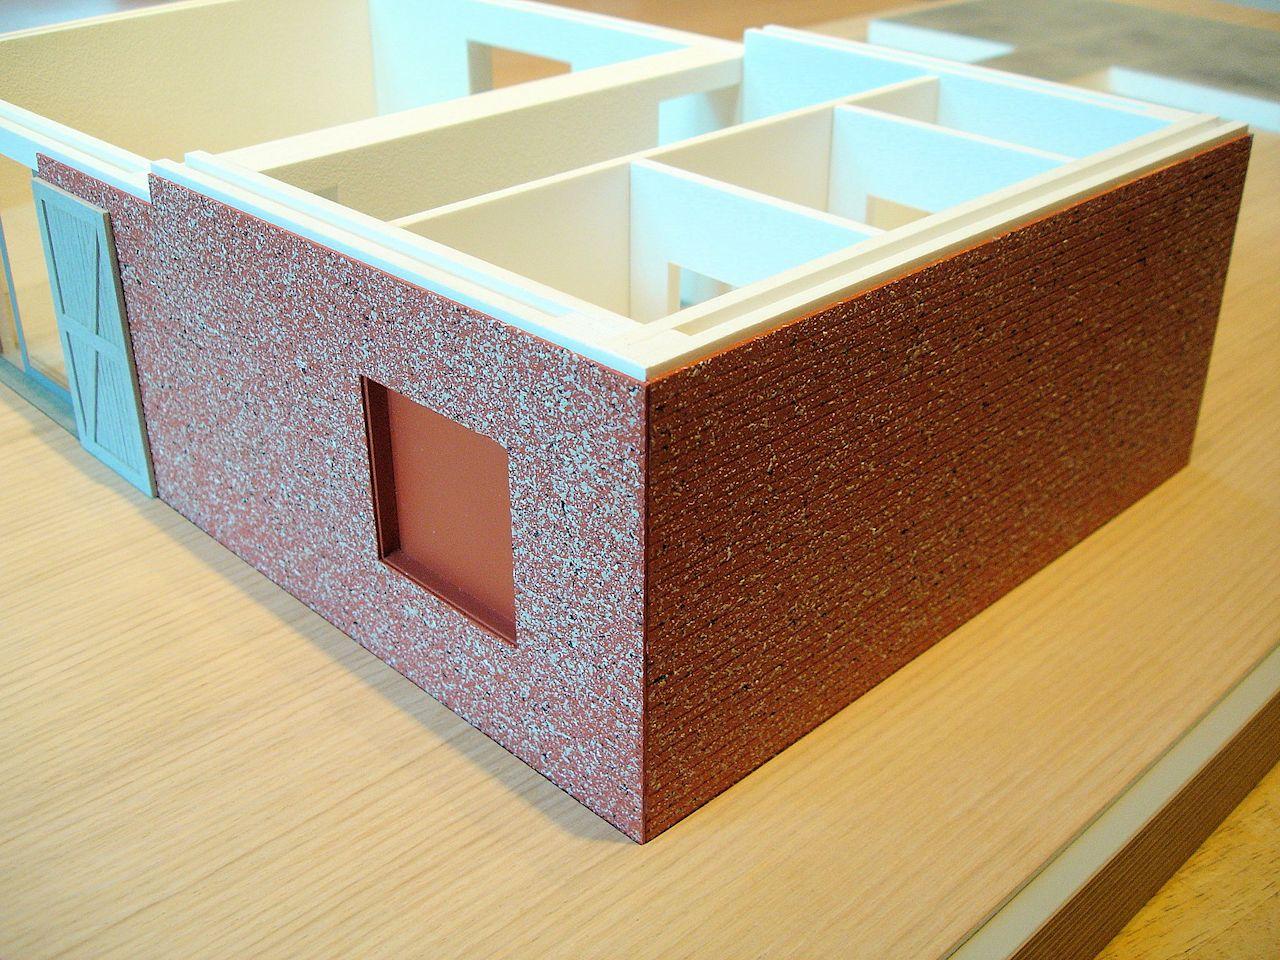 David Neat model-maker, architectural model 2018, generalised brickwork effect